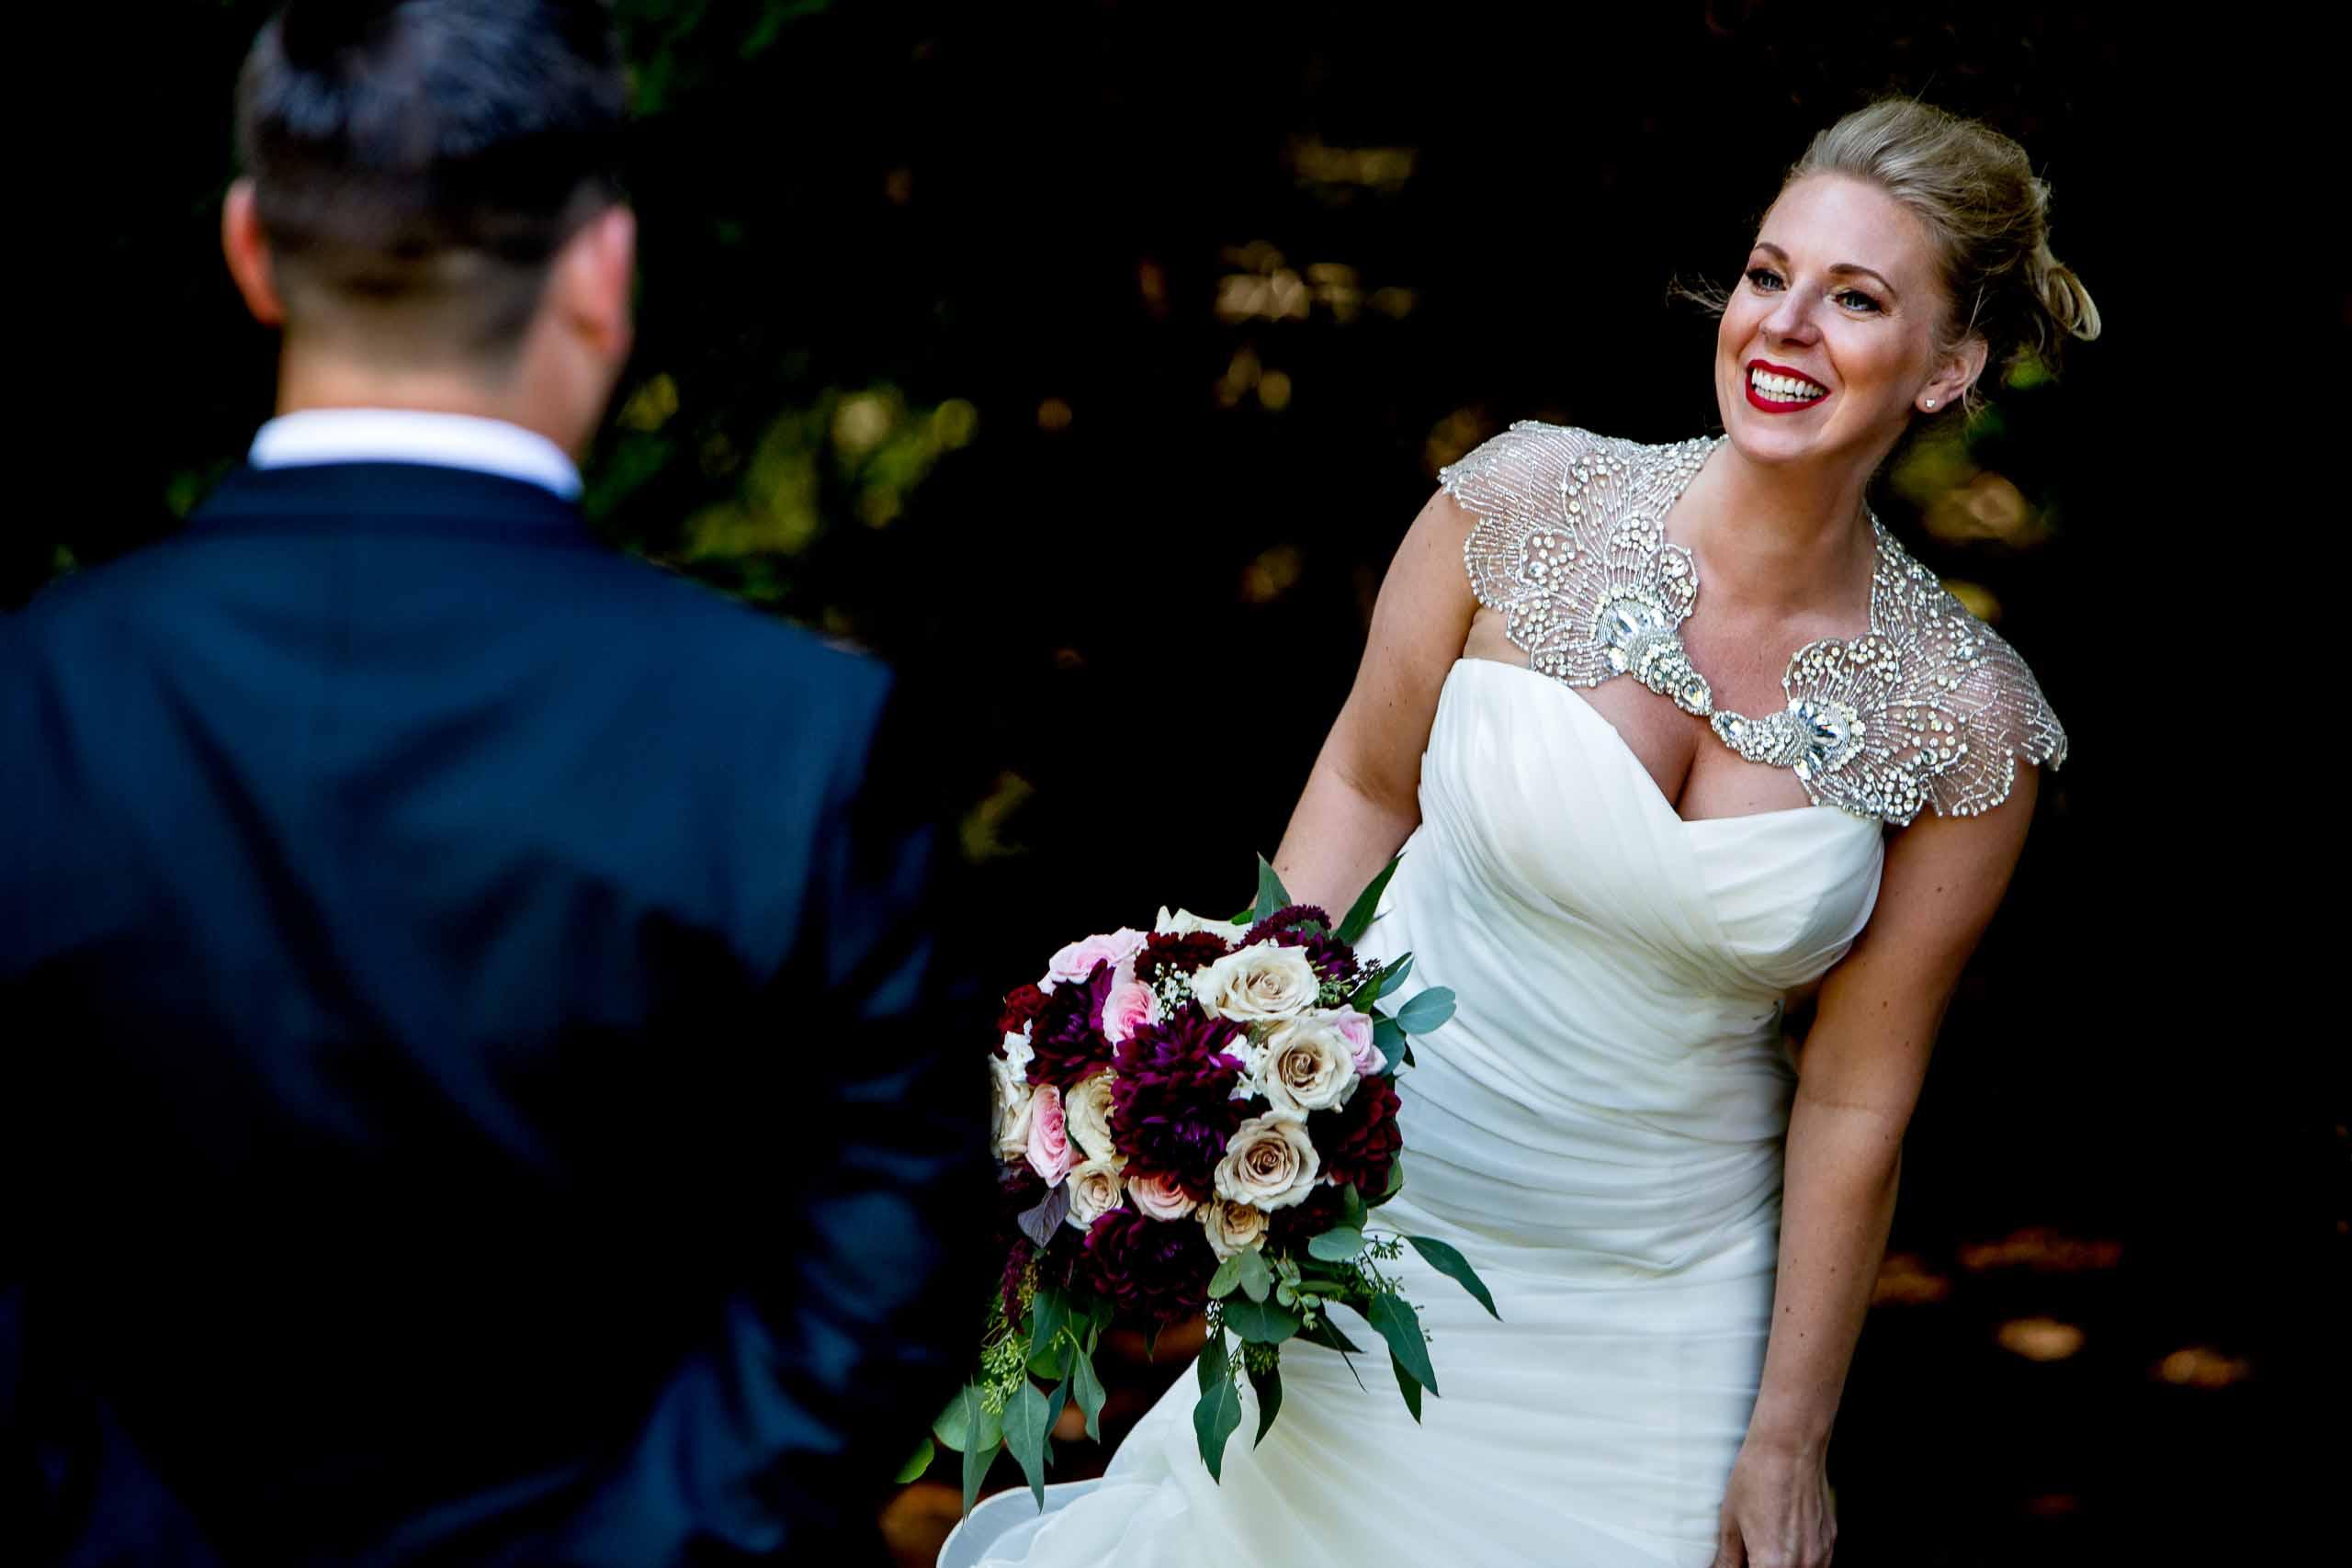 Bride seeing groom first time at Gorge Crest wedding venue near Hood River just outside Portland, Oregon.